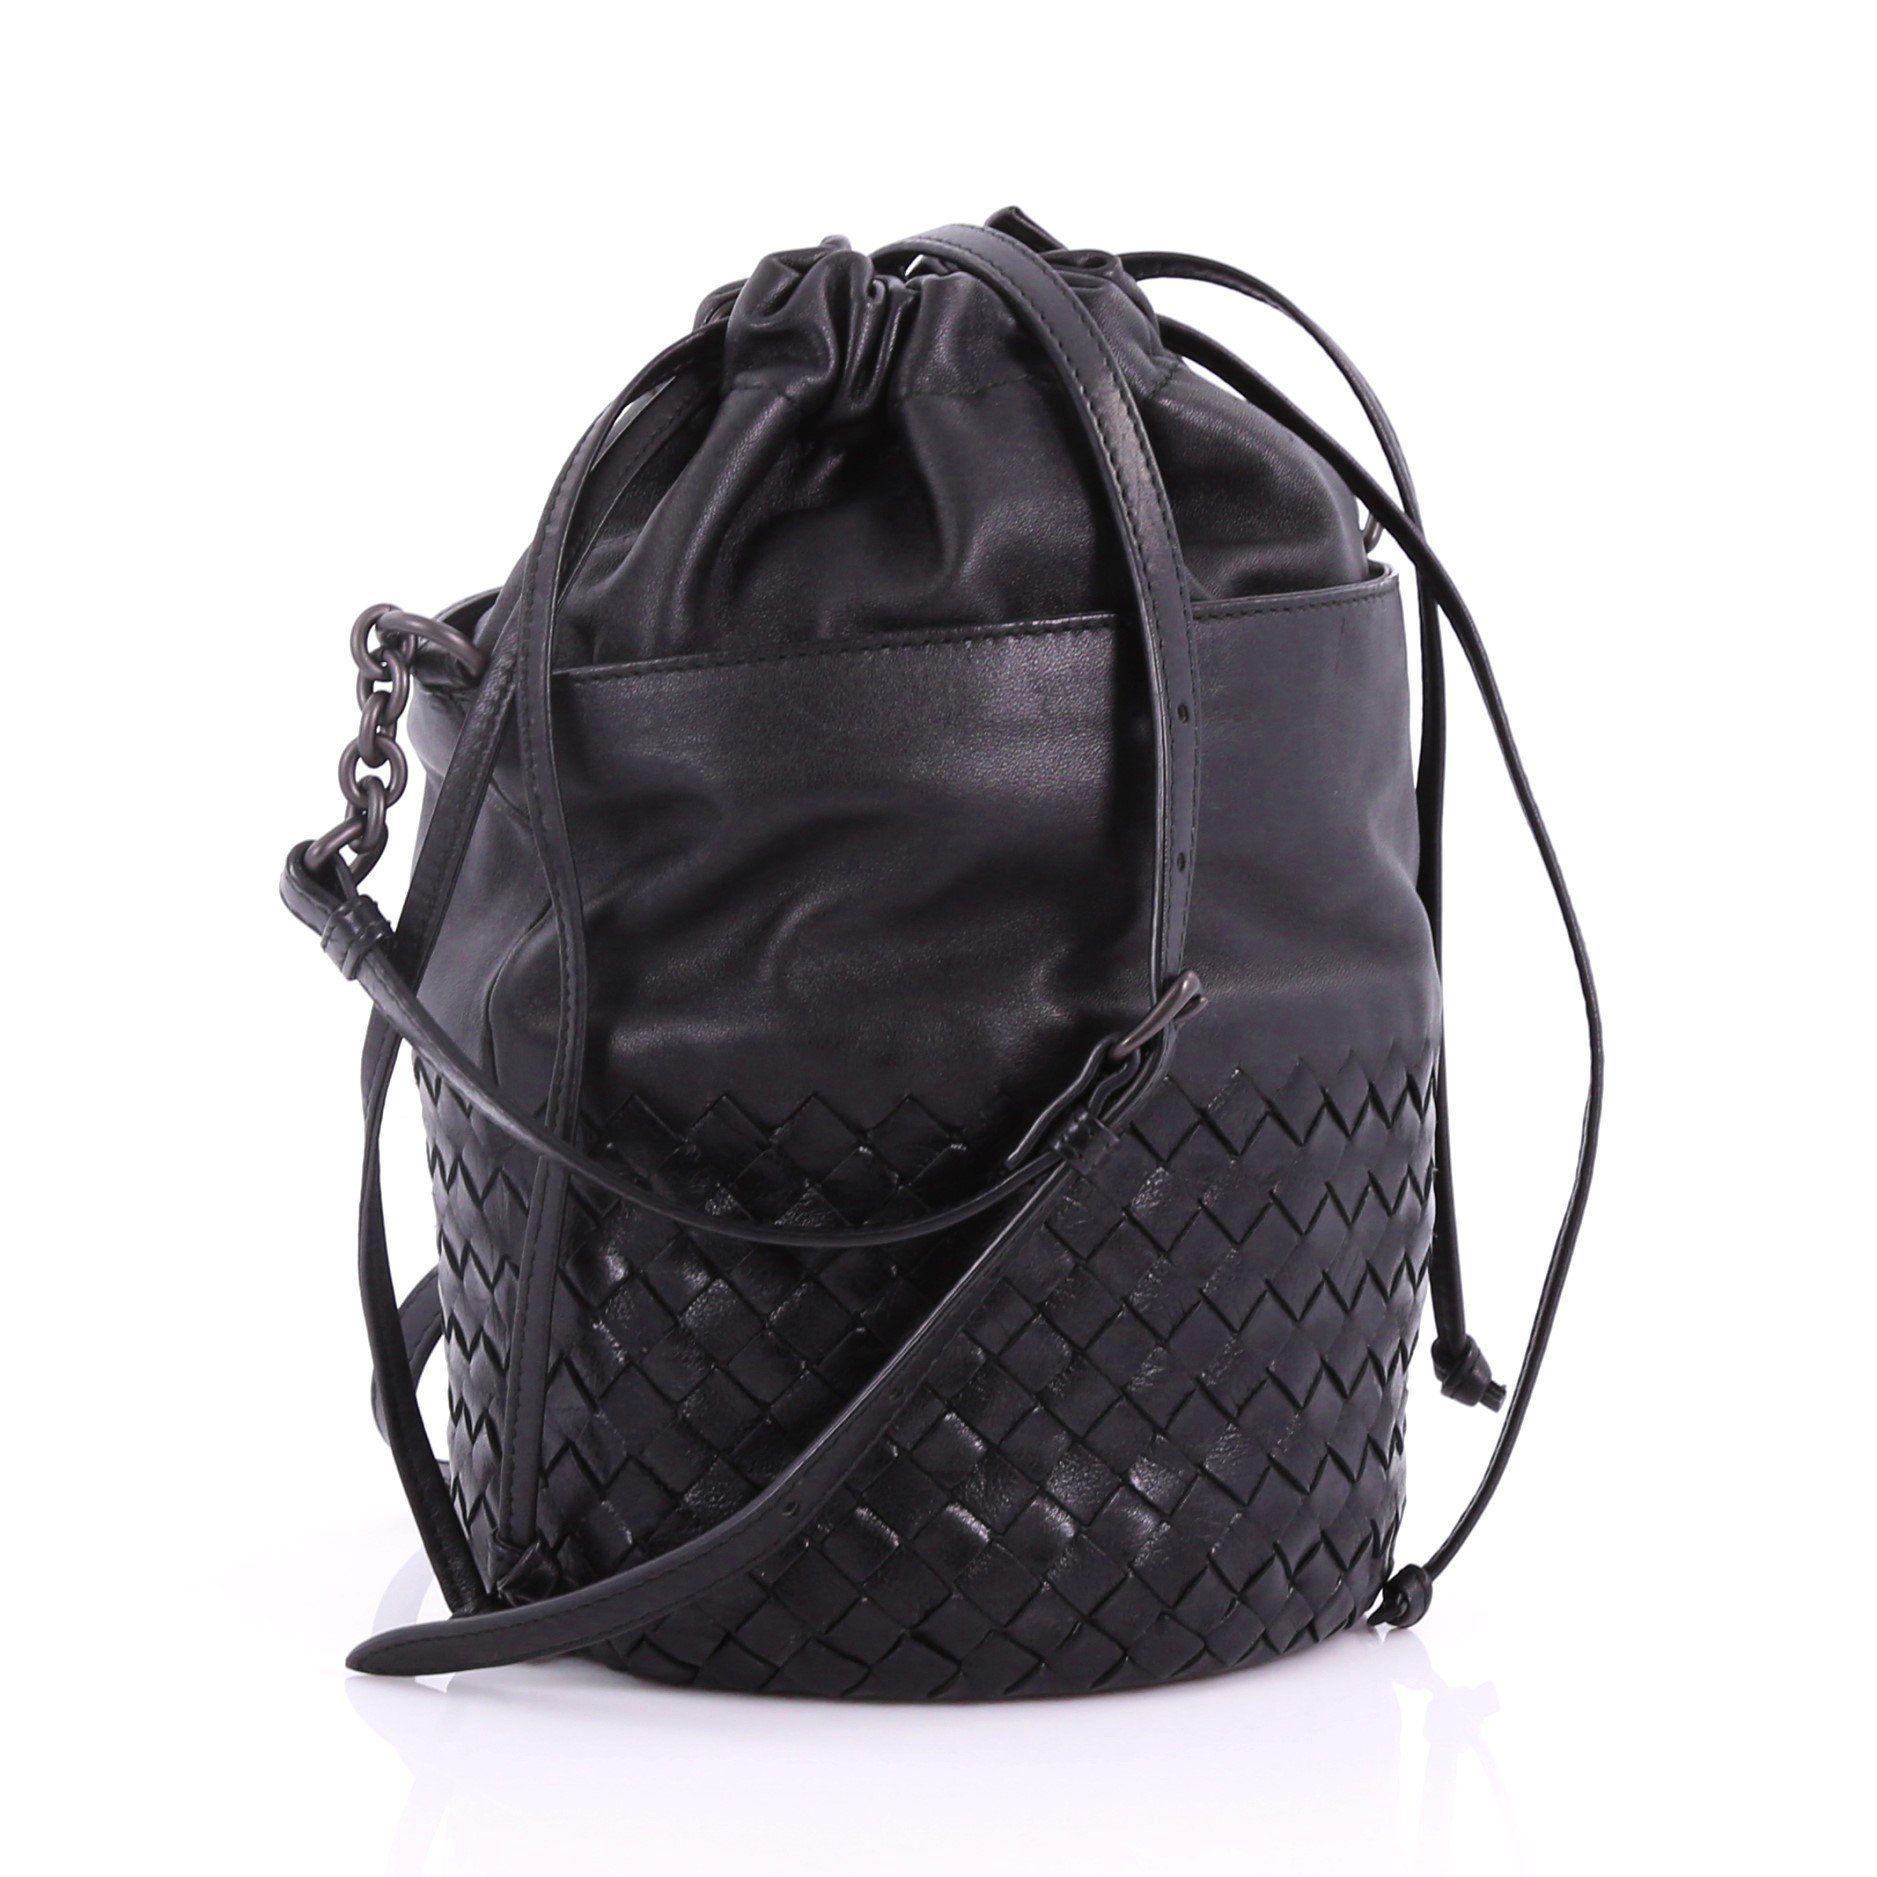 0b1a83d8b0e3 Bottega Veneta - Black Pre Owned Drawstring Bucket Bag Leather And  Intrecciato Nappa Small - Lyst. View fullscreen